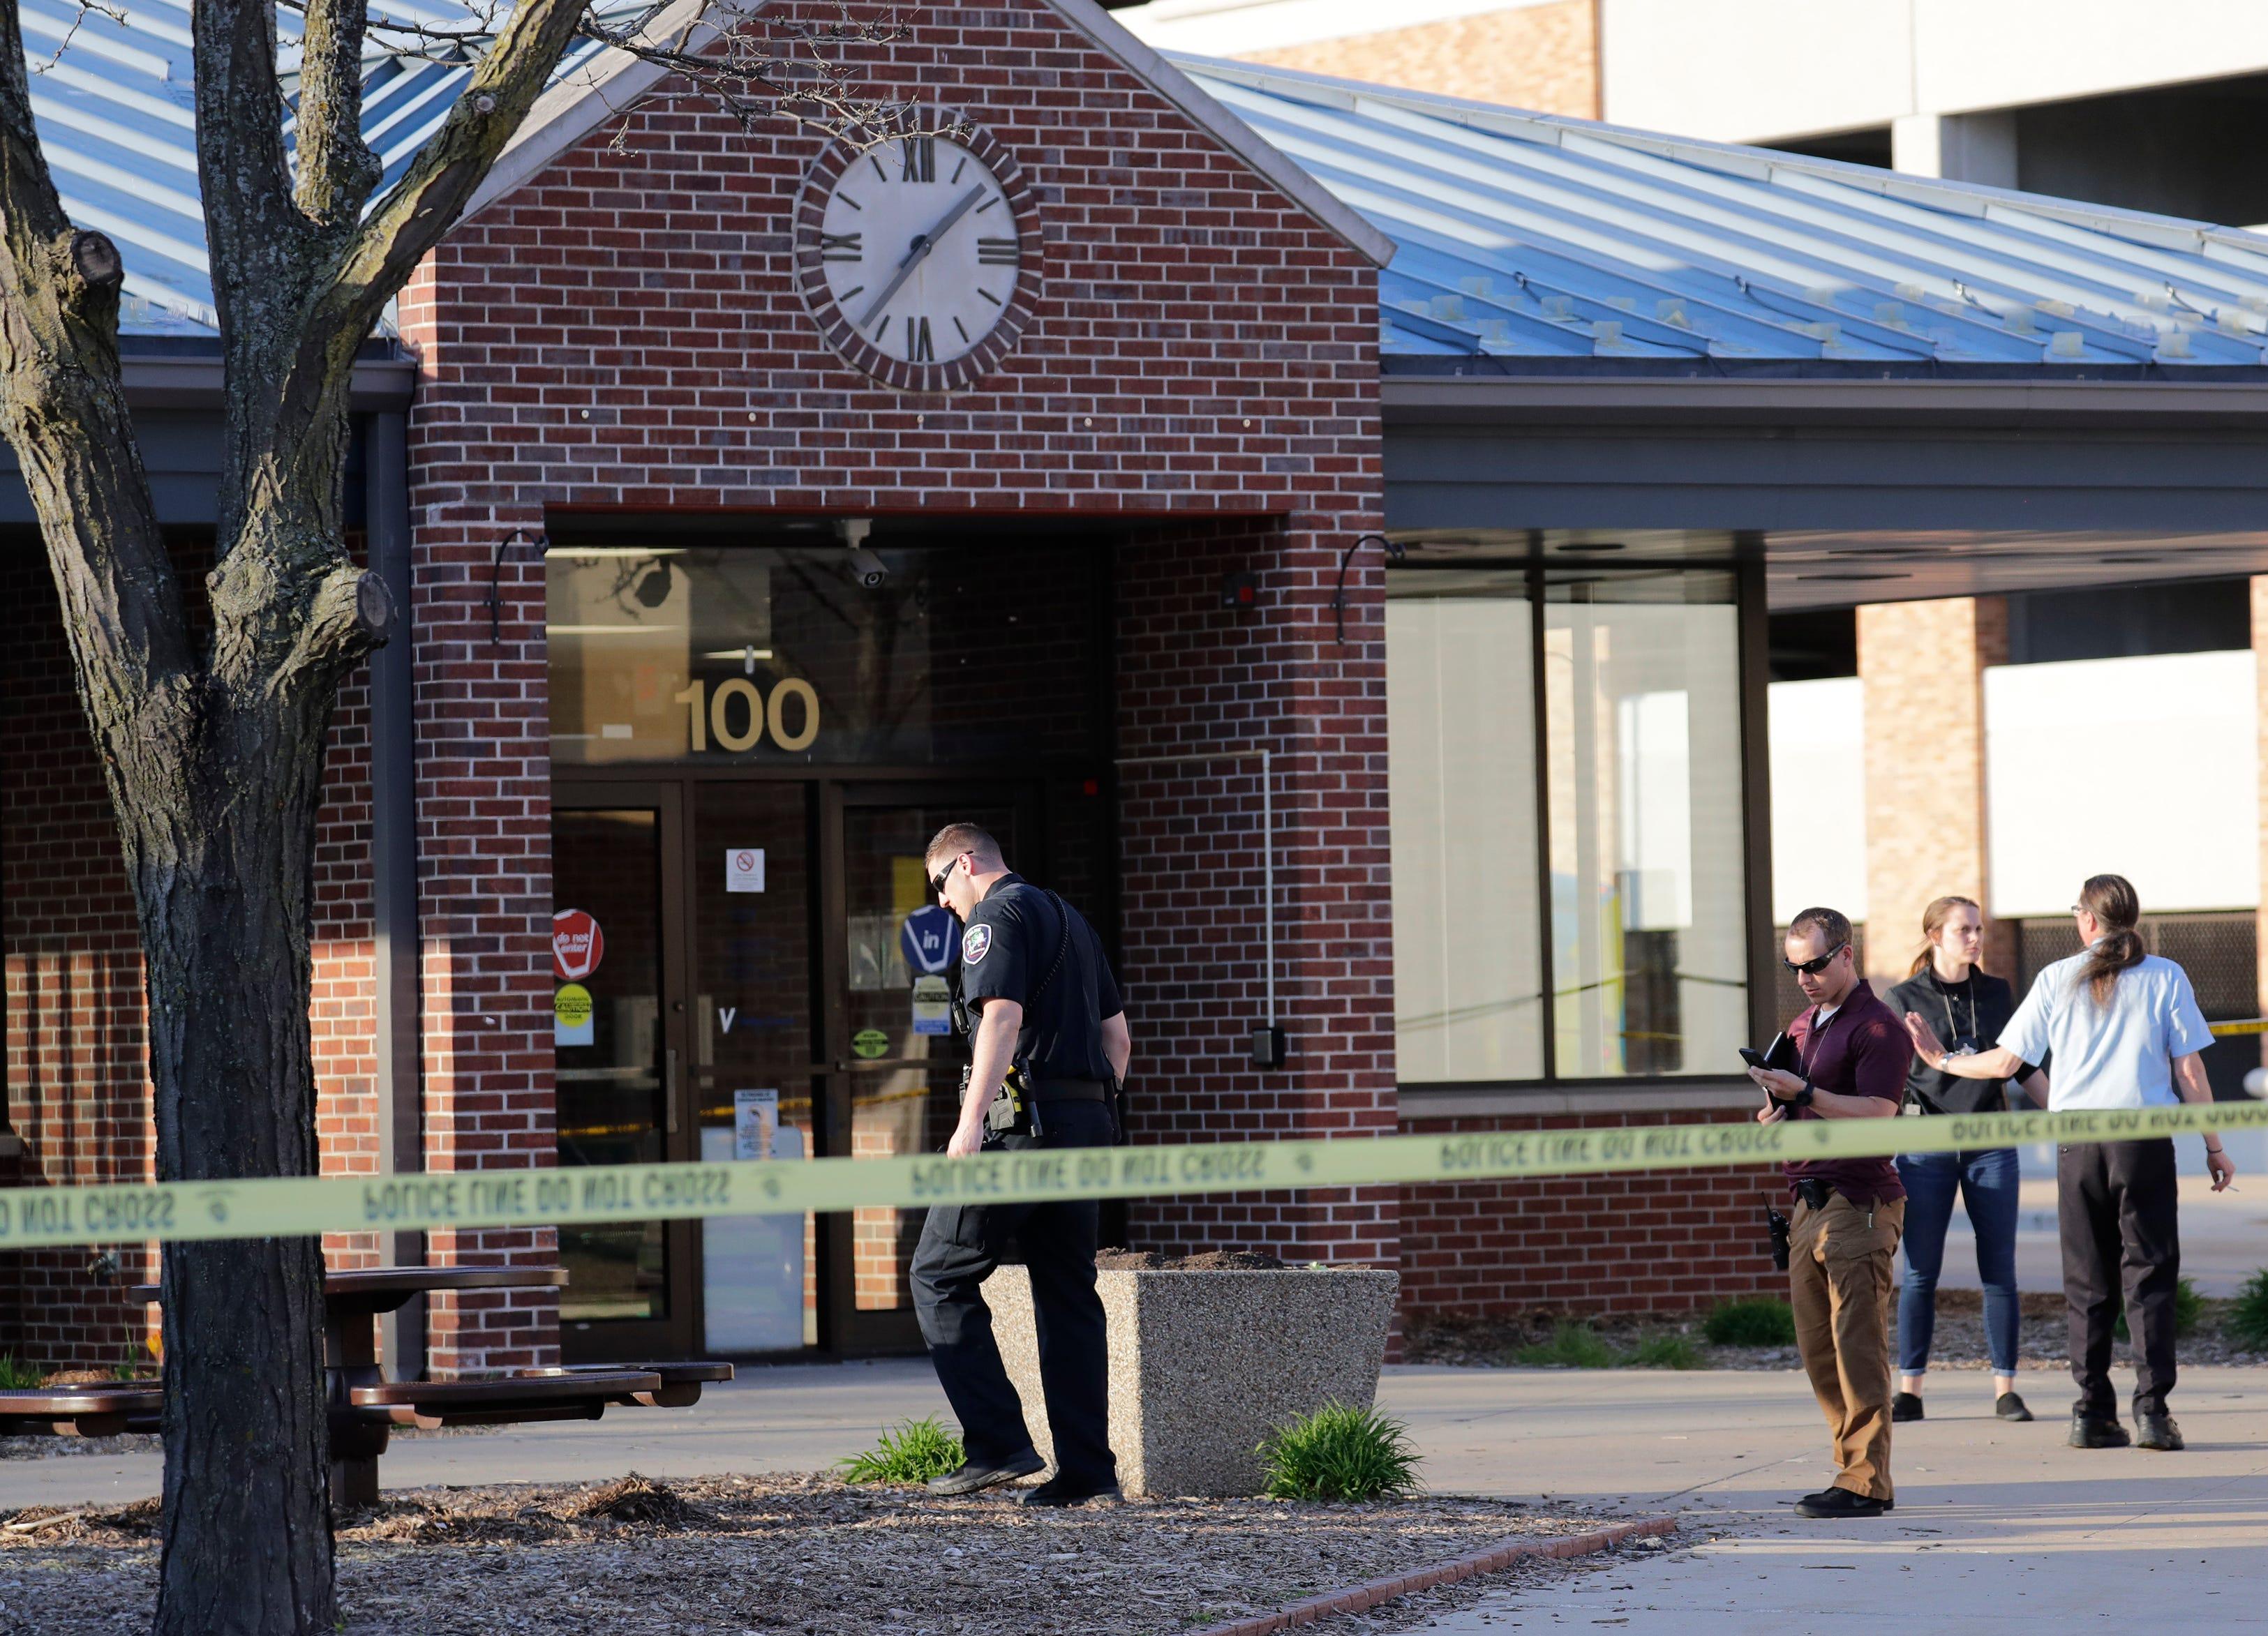 'Heroic bravery': Appleton police officers draw praise for stopping gunman at Valley Transit Center